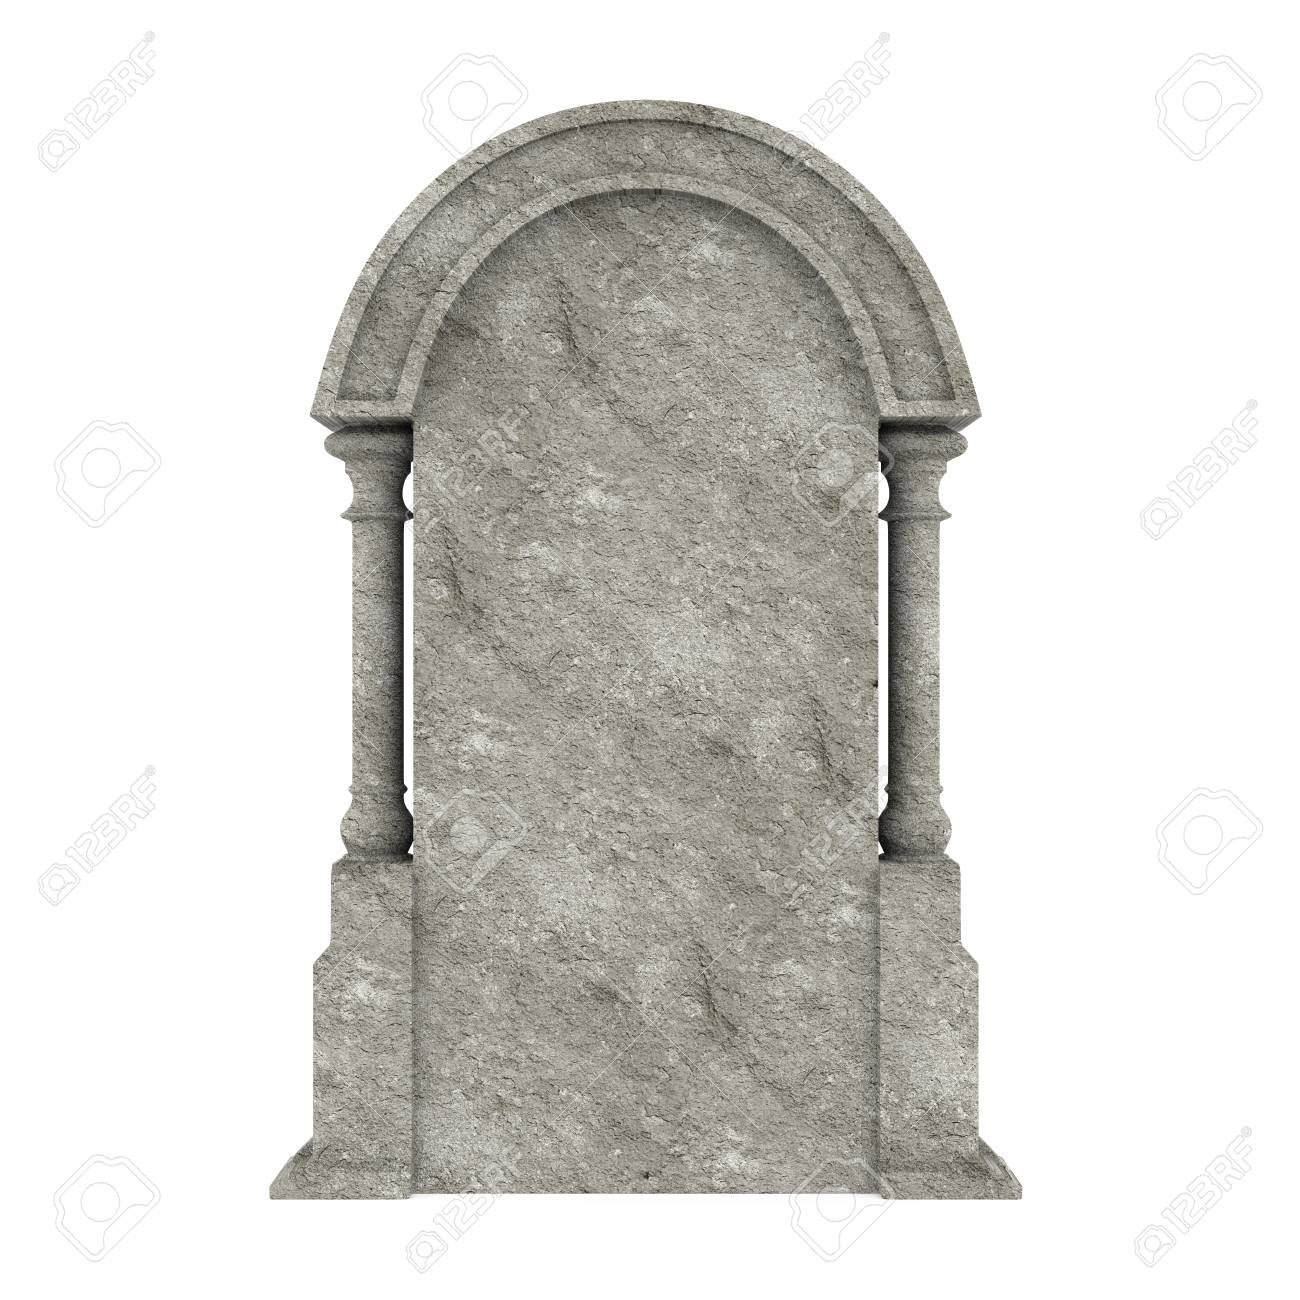 Blank Gravestone Isolated - 88332000